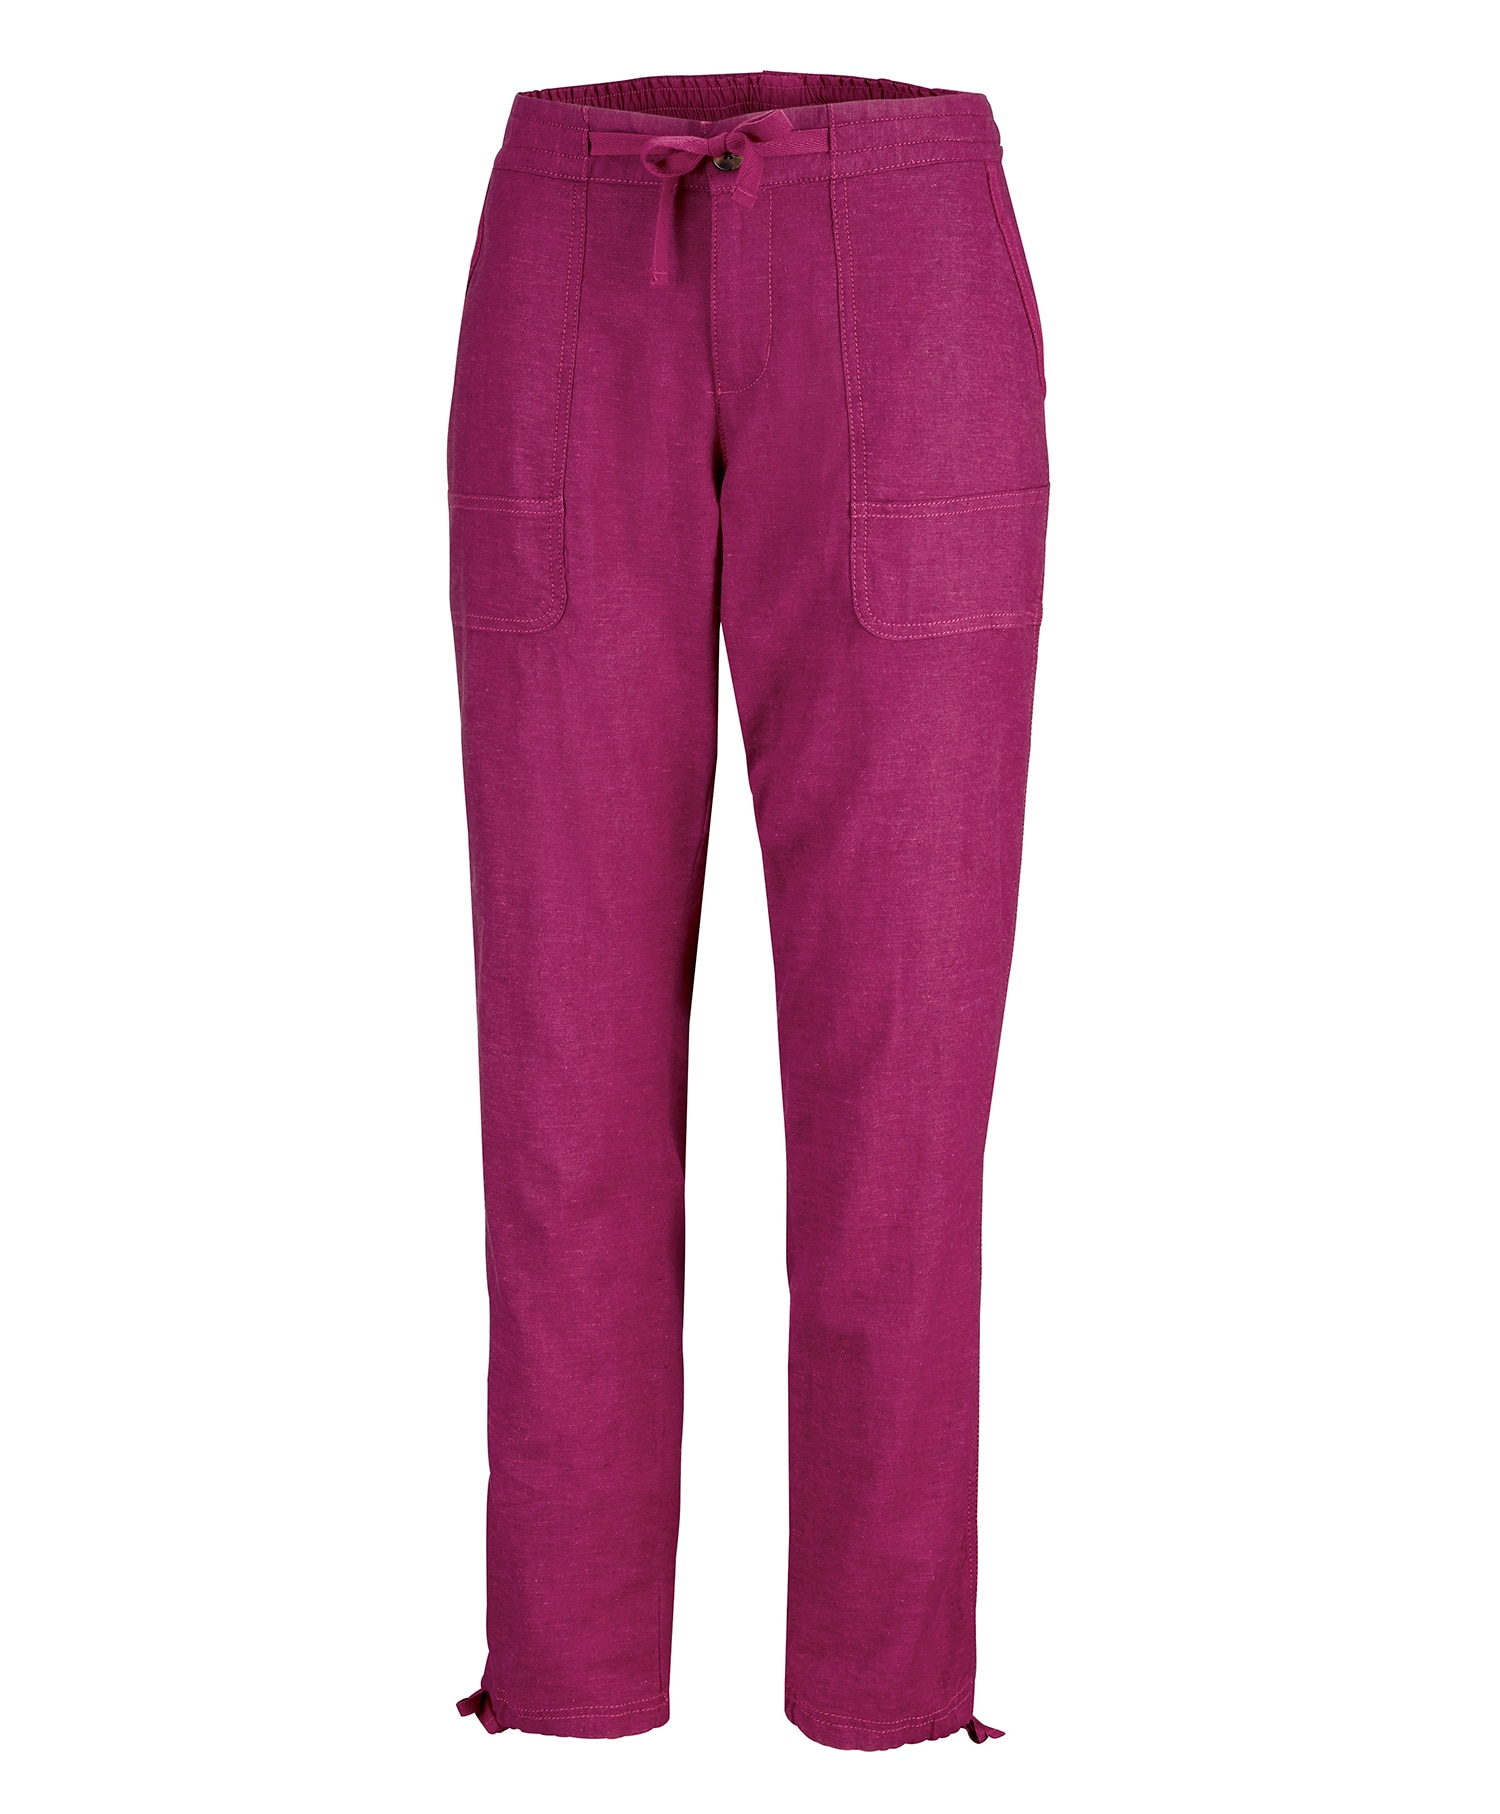 Columbia Cotton Pants